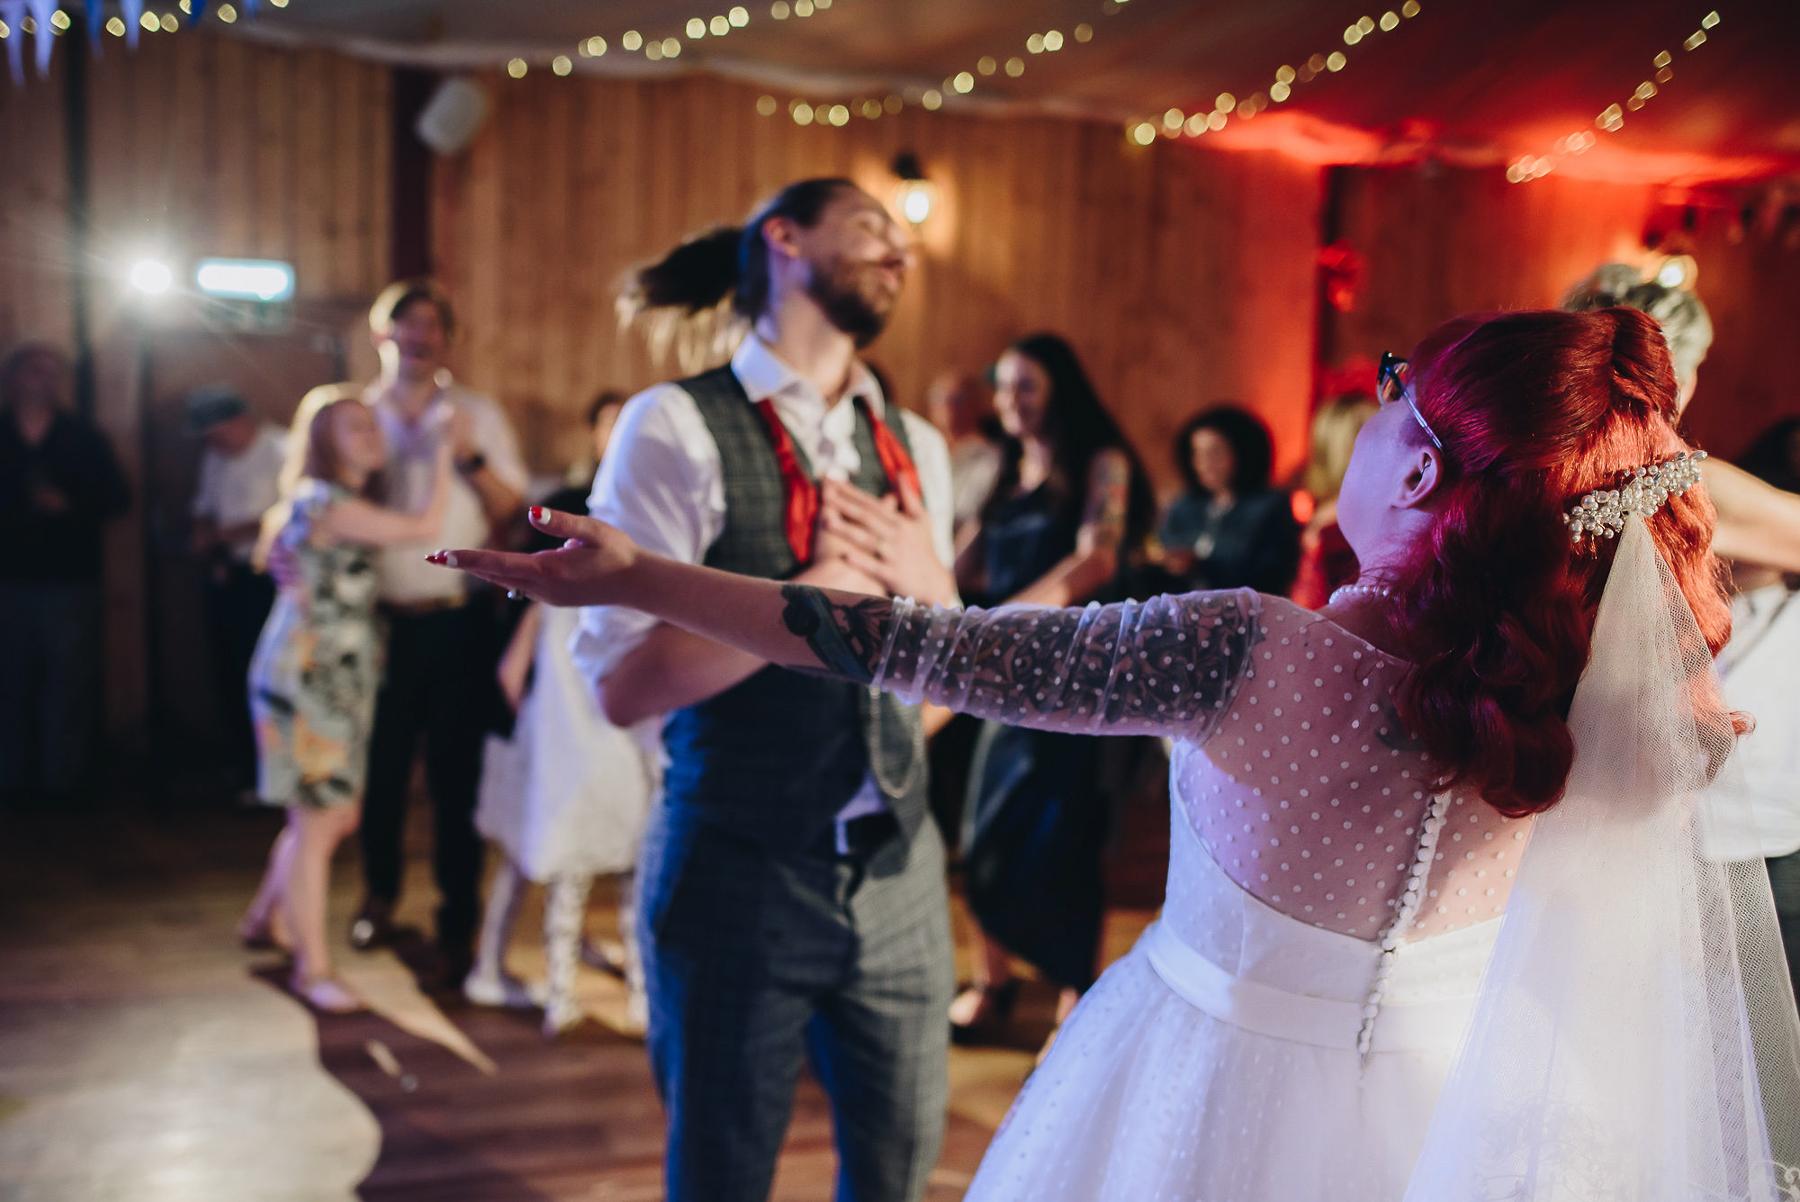 Wellbeing_Farm_Wedding_Photography_The_Pin-Up_Bride_Lara_Shaun-144.jpg